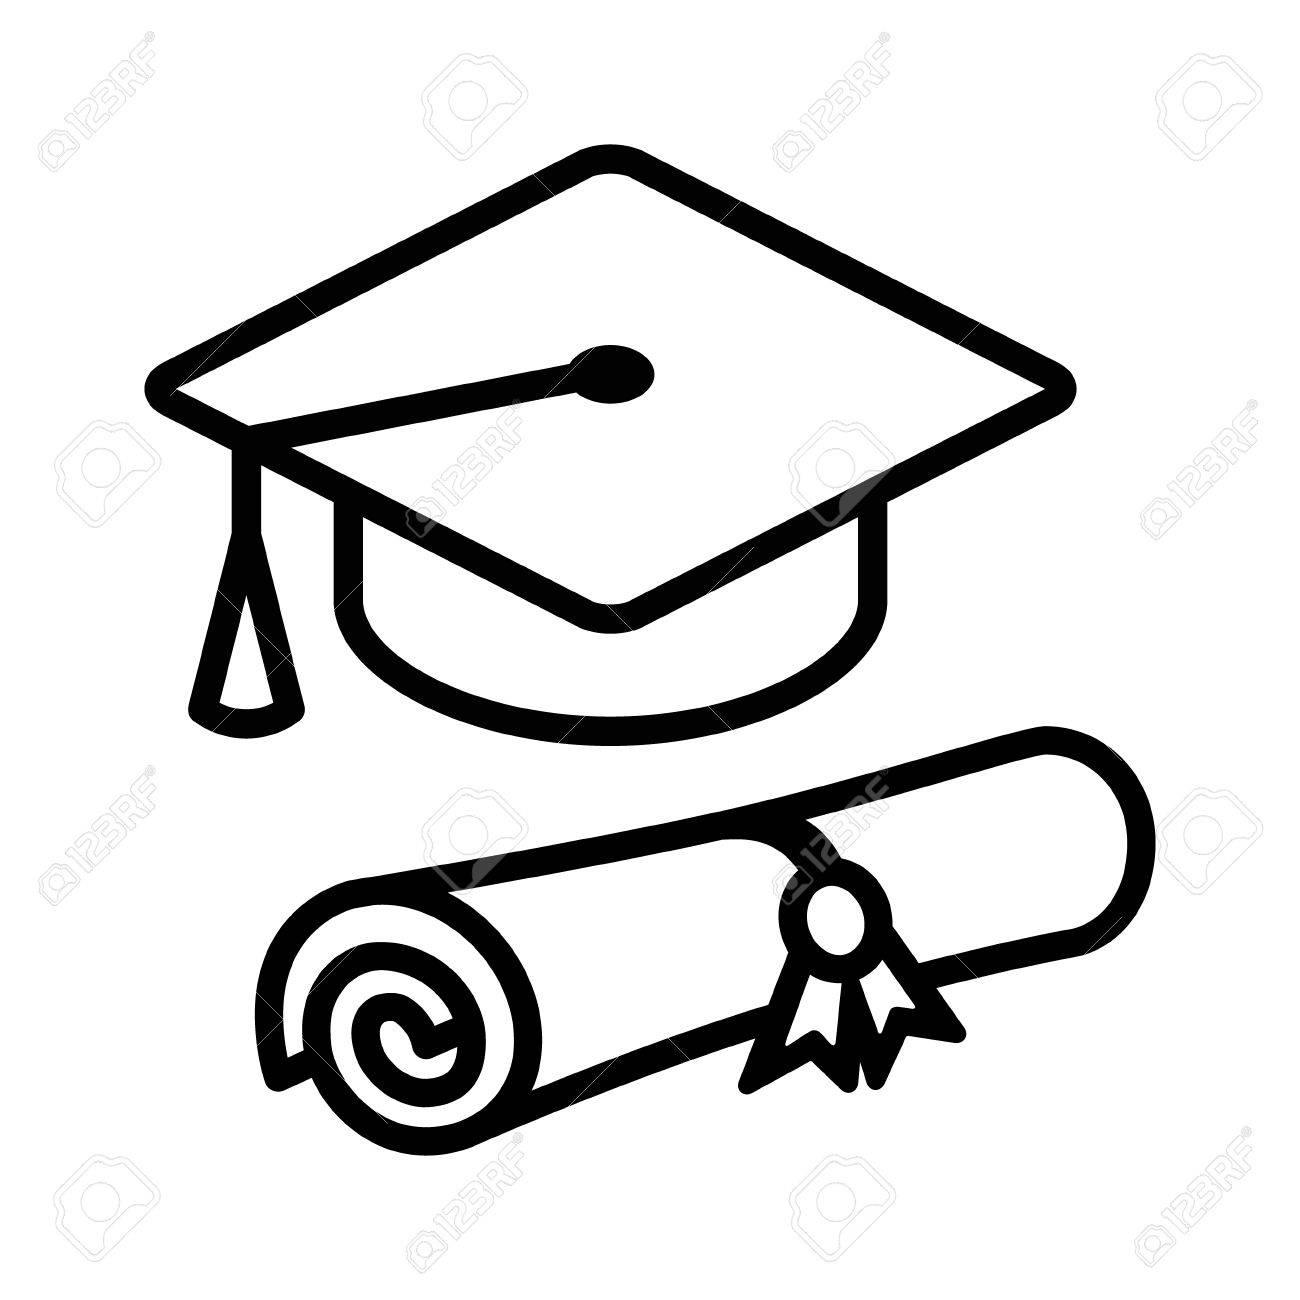 graduation cap hat with diploma line art icon for apps and websites rh 123rf com graduation cap and diploma clipart toga cap and diploma clipart